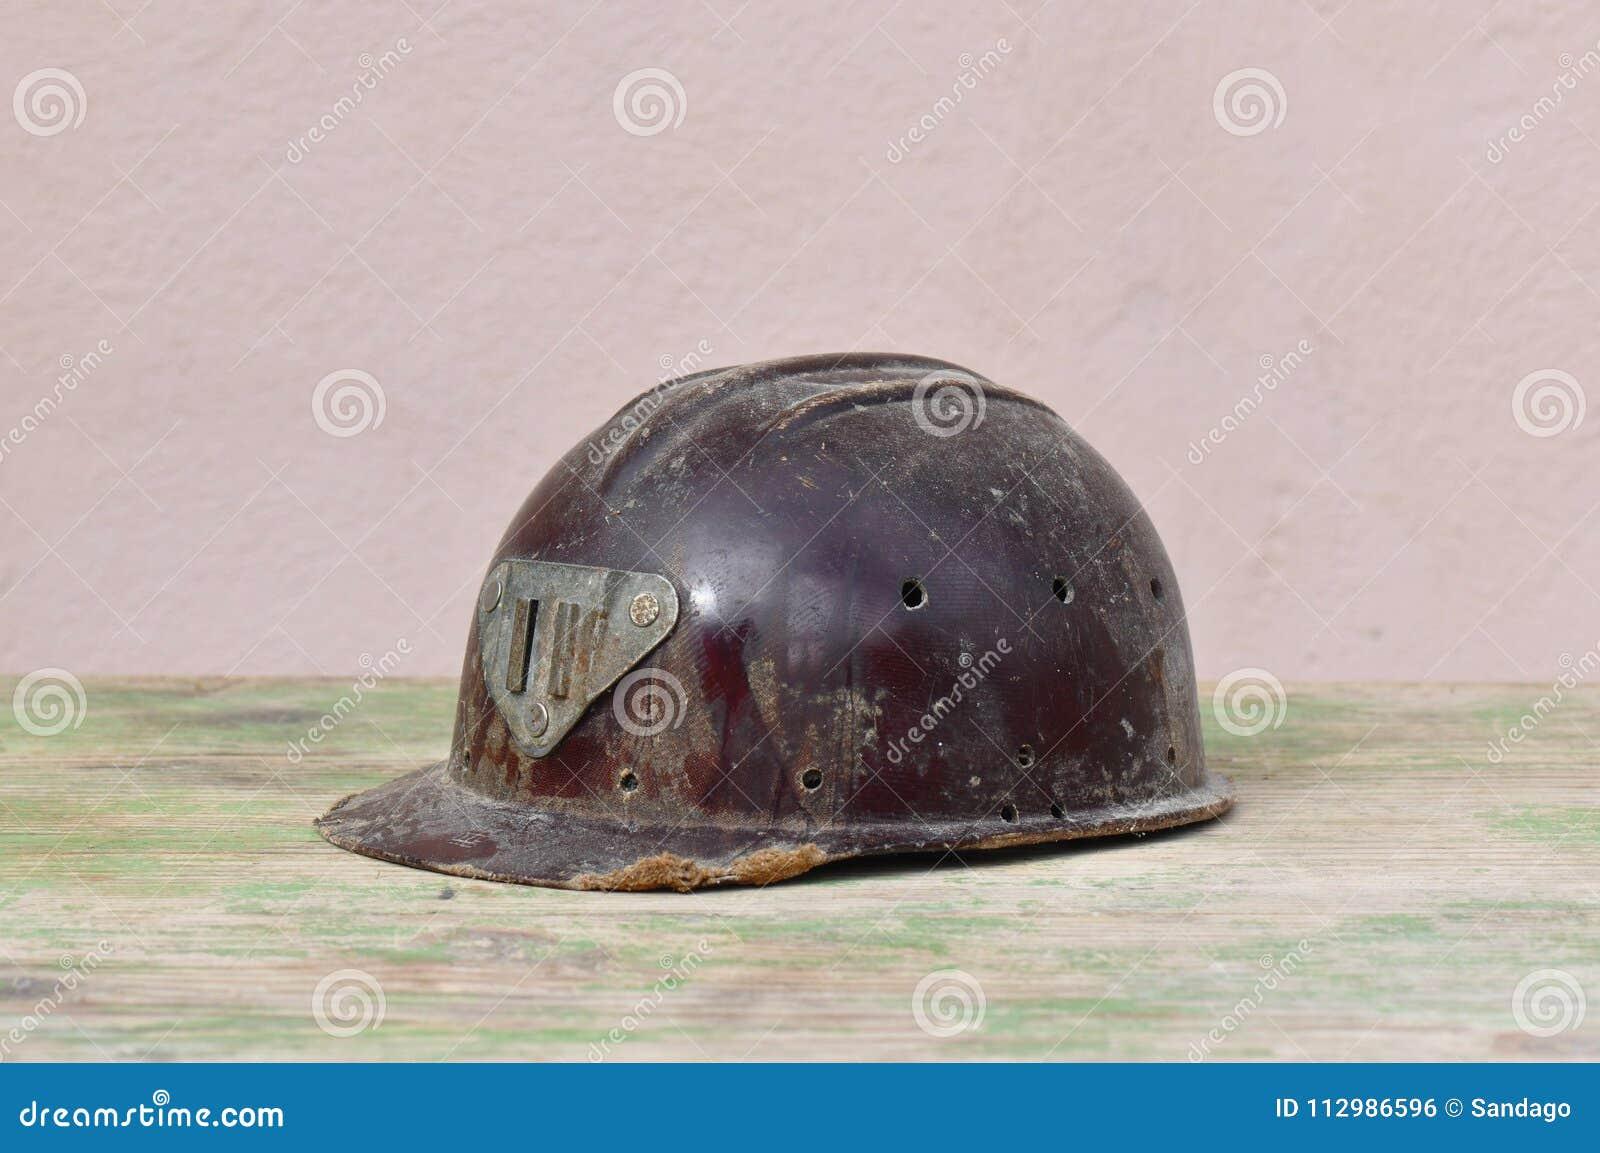 Old helmet of miner